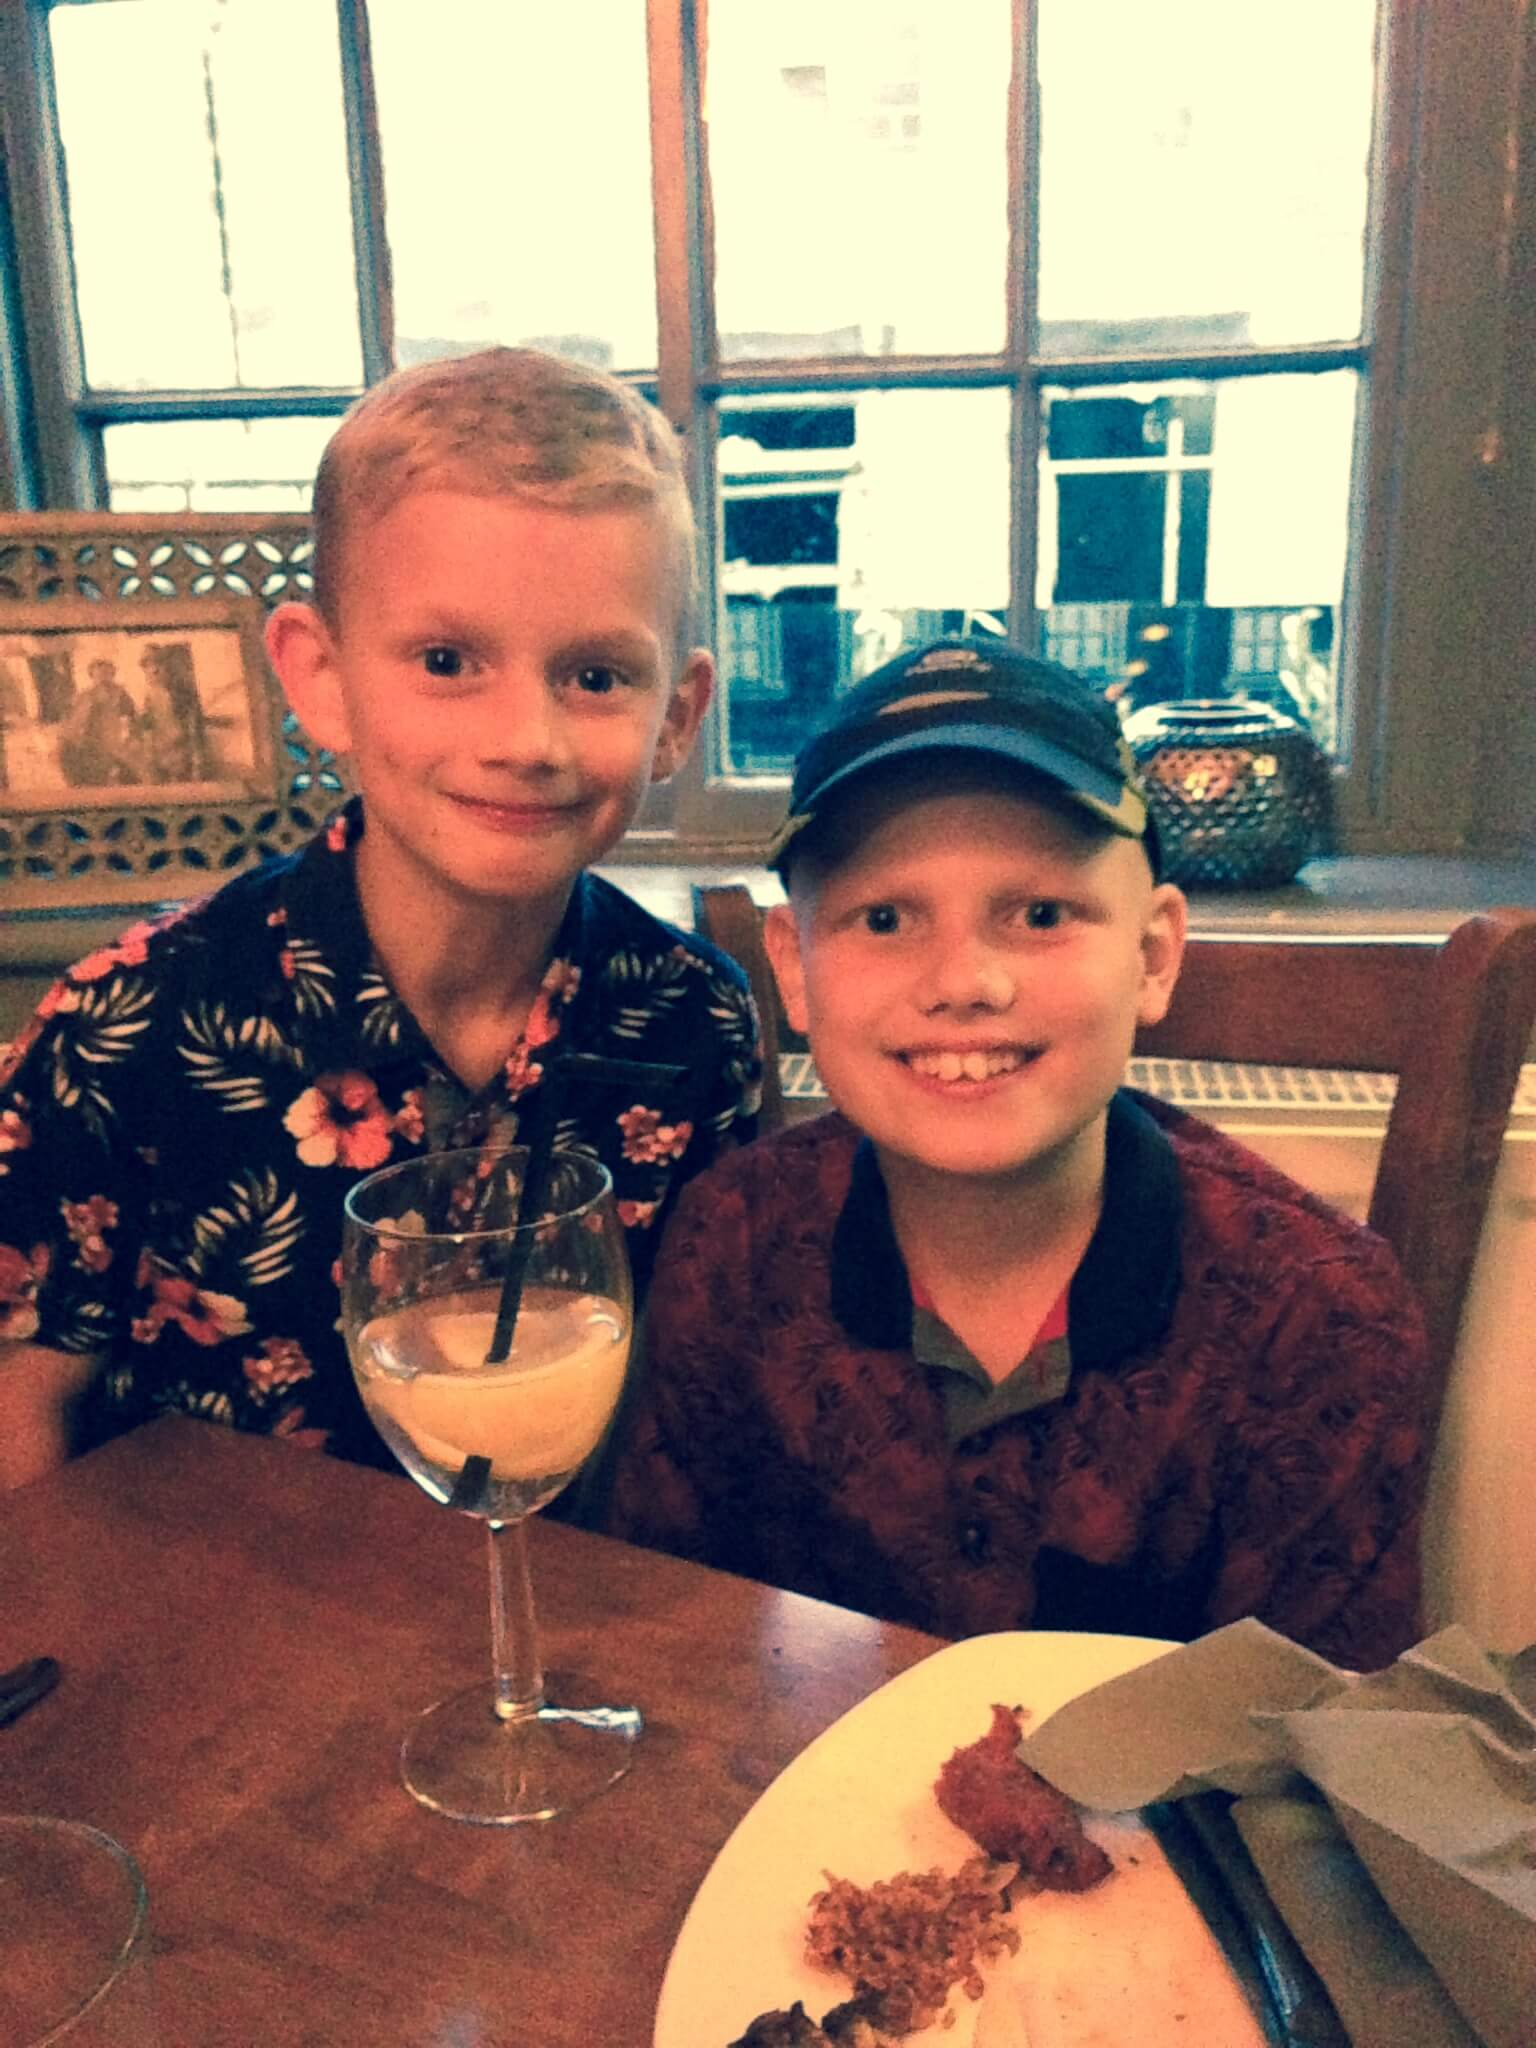 Isaac and brother Noah at meal at end of phase 4